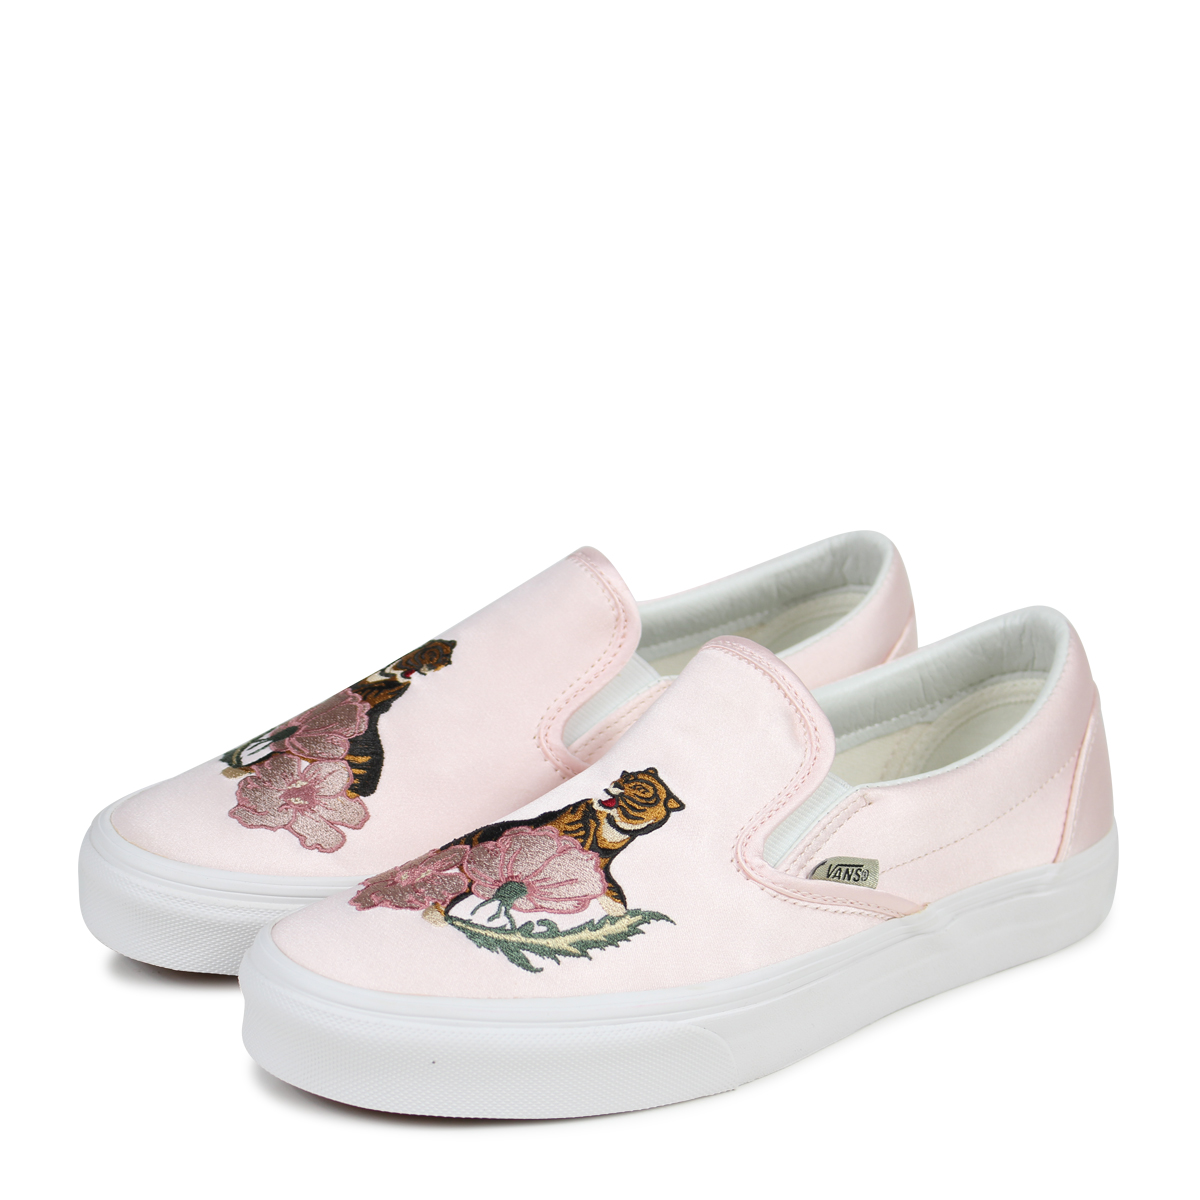 74581be6bb1 ALLSPORTS  VANS CLASSIC SLIP-ON DX slip-ons sneakers men gap Dis ...